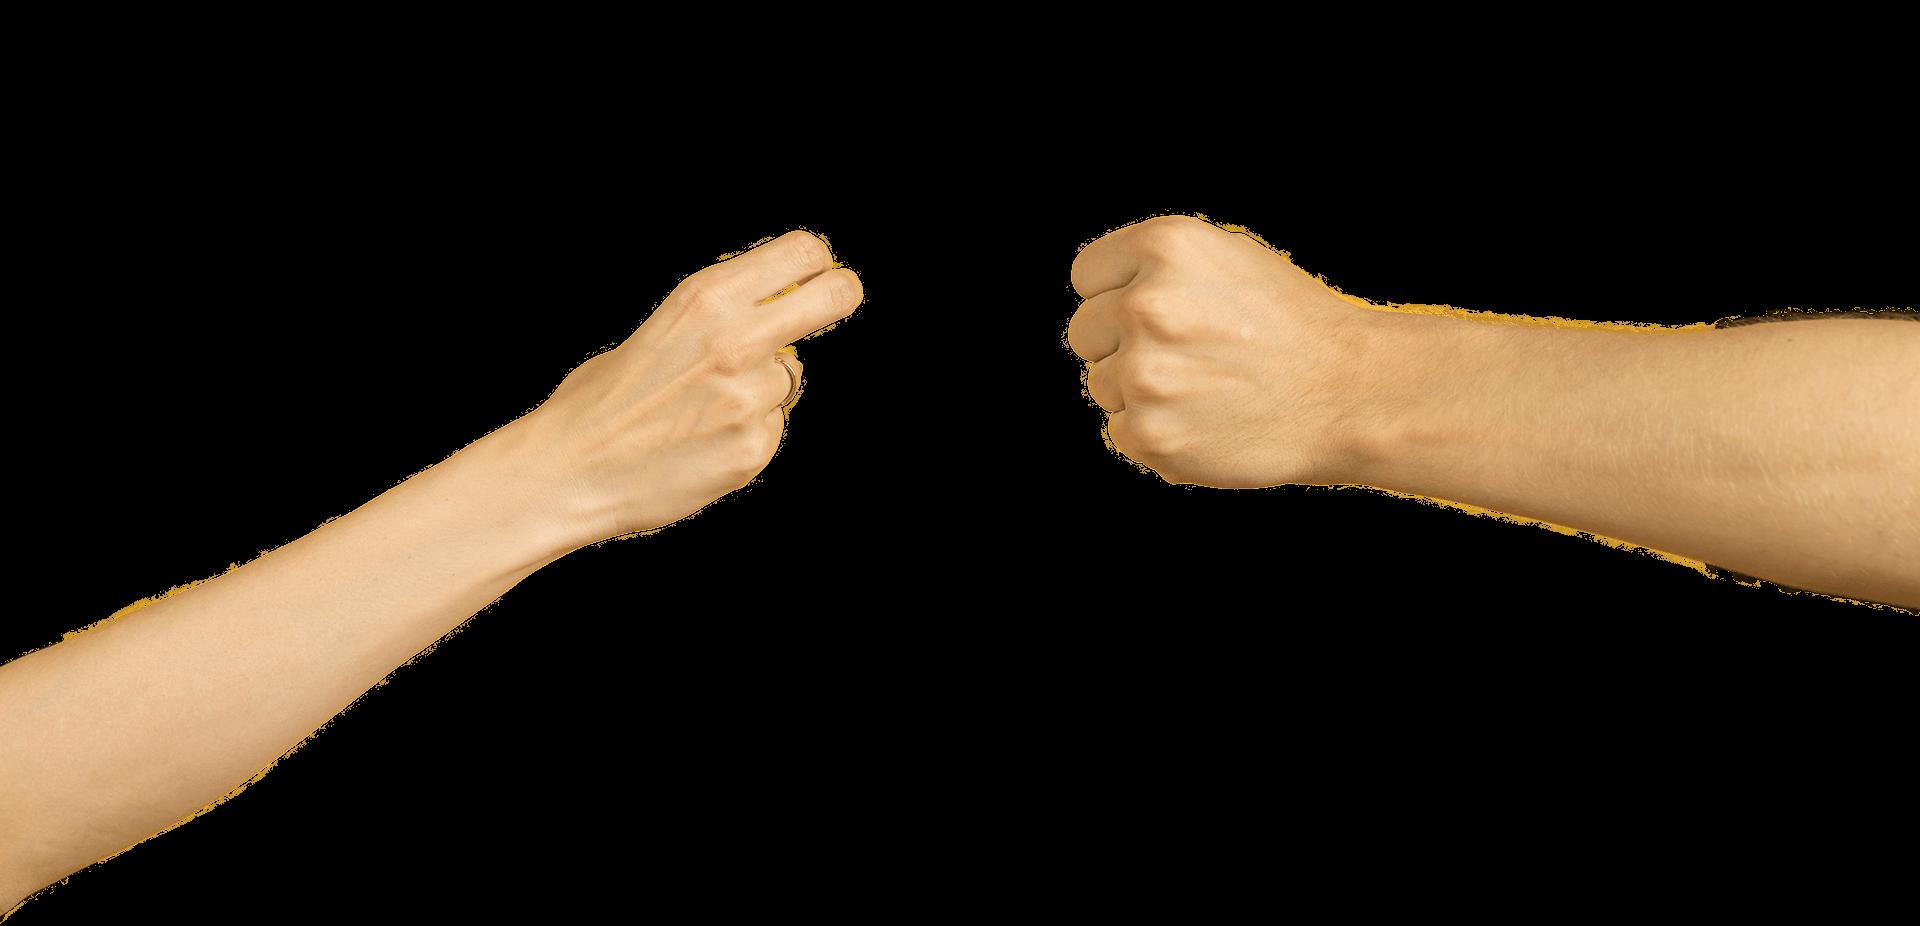 Photo of 2 hands making a snail shape, snail step 2